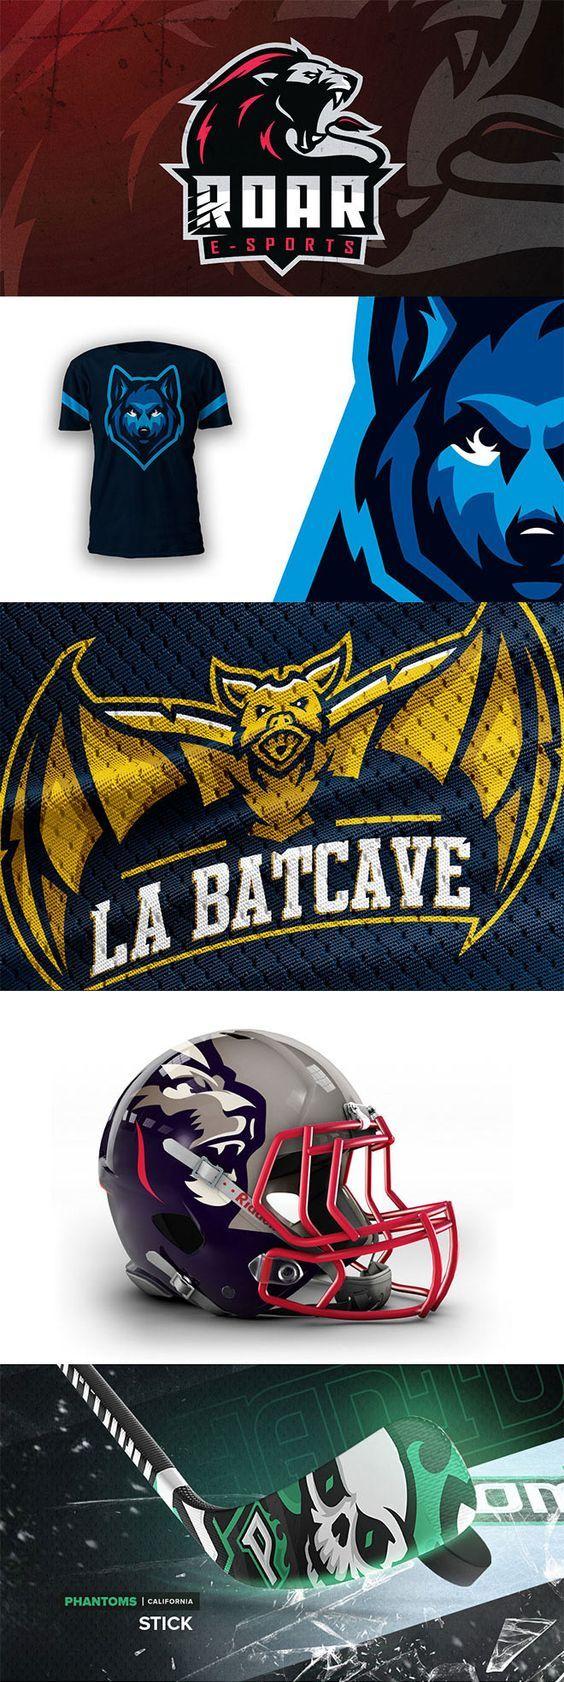 45 Mascot Logo Designs for Sports & eSports Teams Car